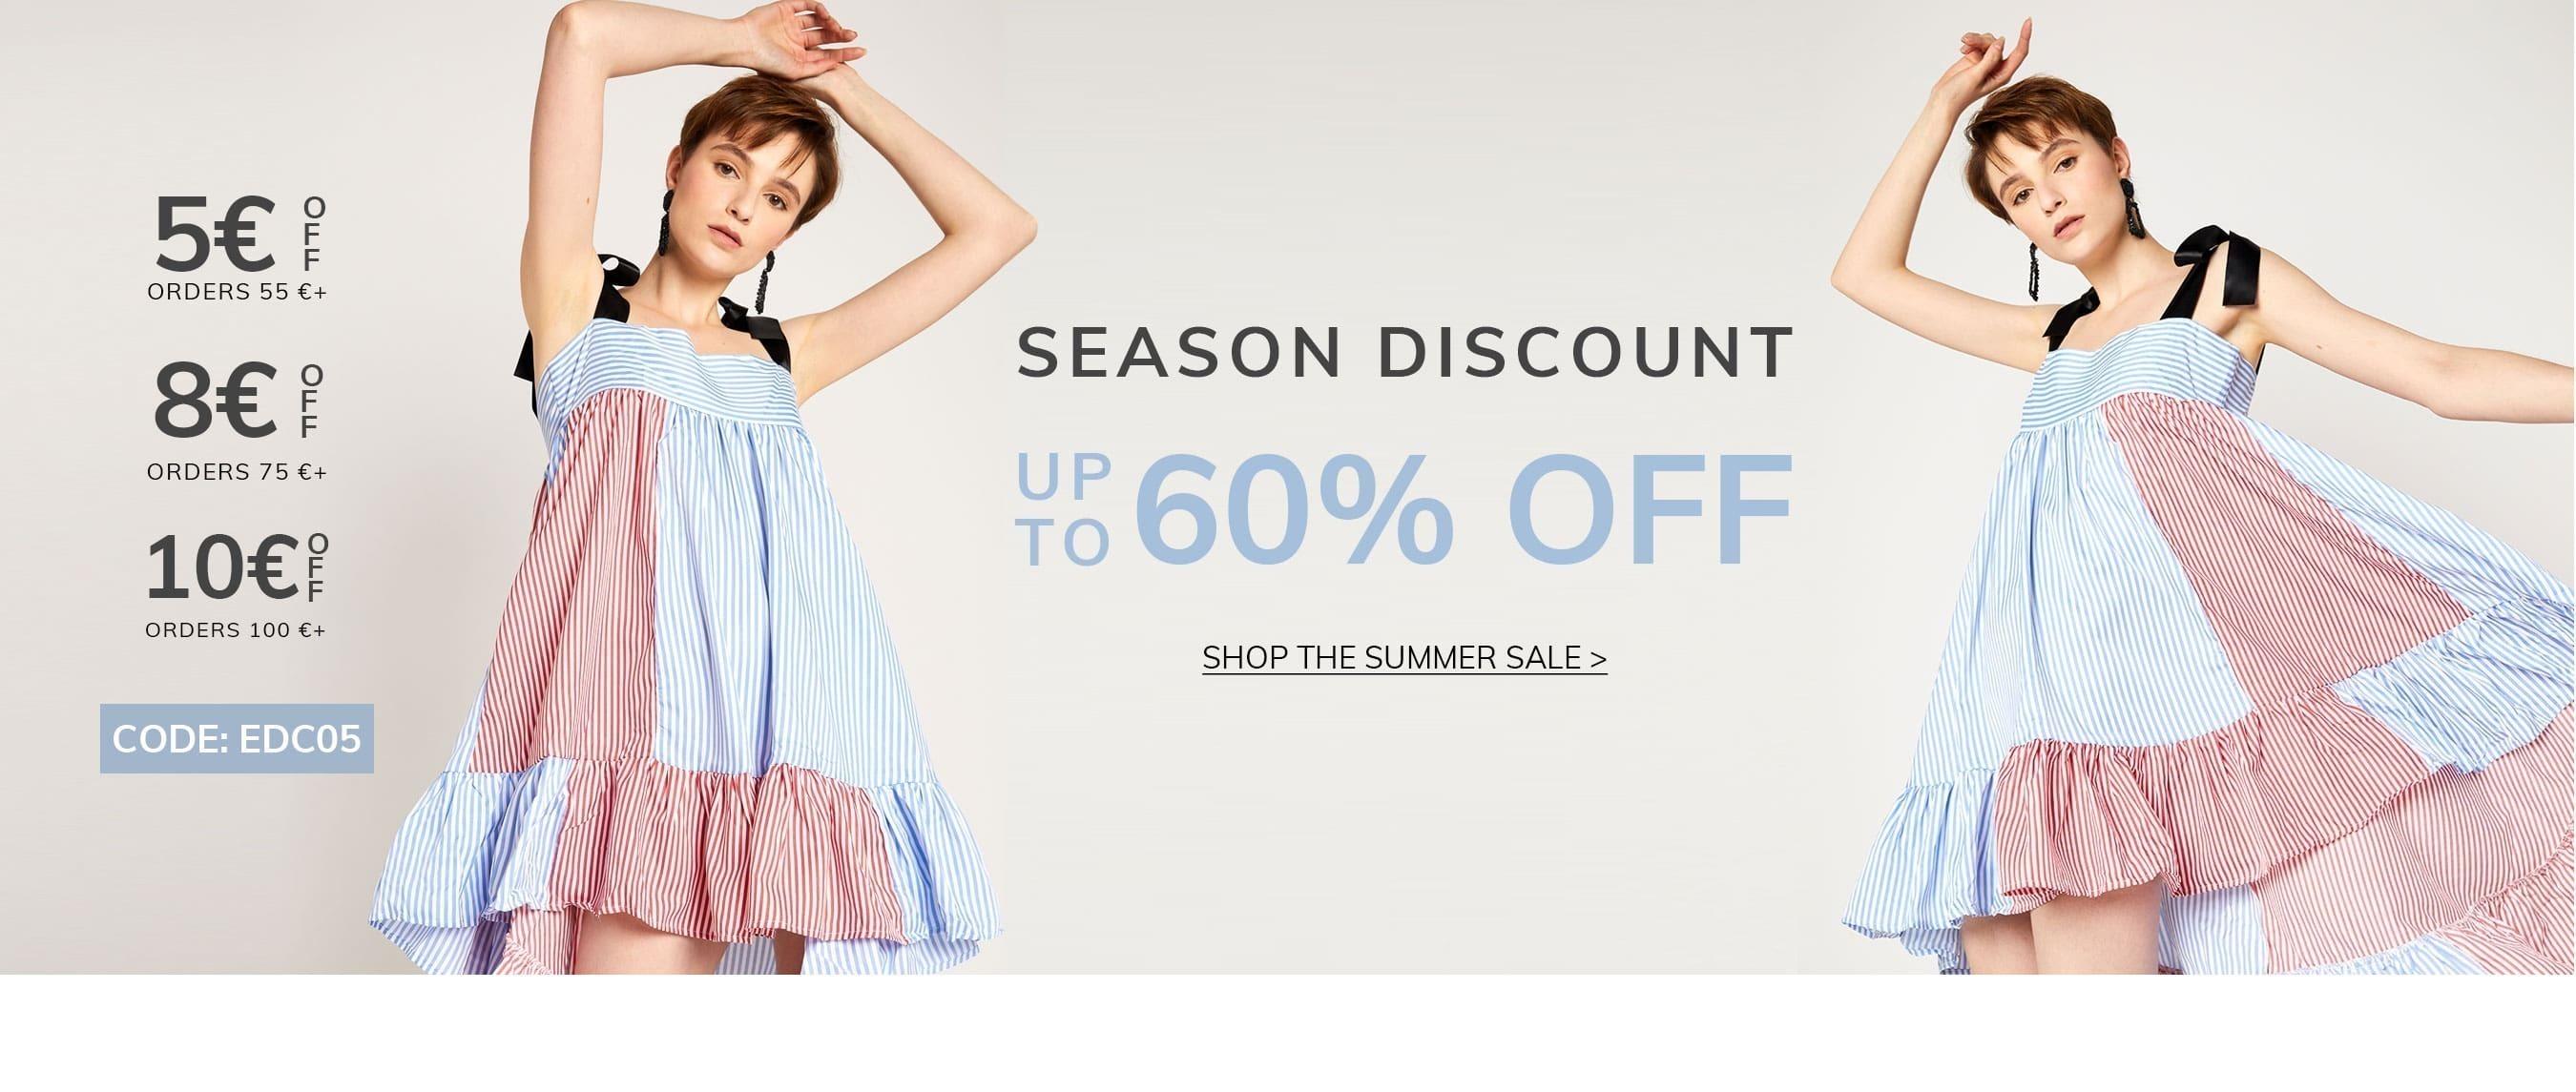 2f807fdf225 SHEIN | Women's Clothing | Shop Clothes & Fashion